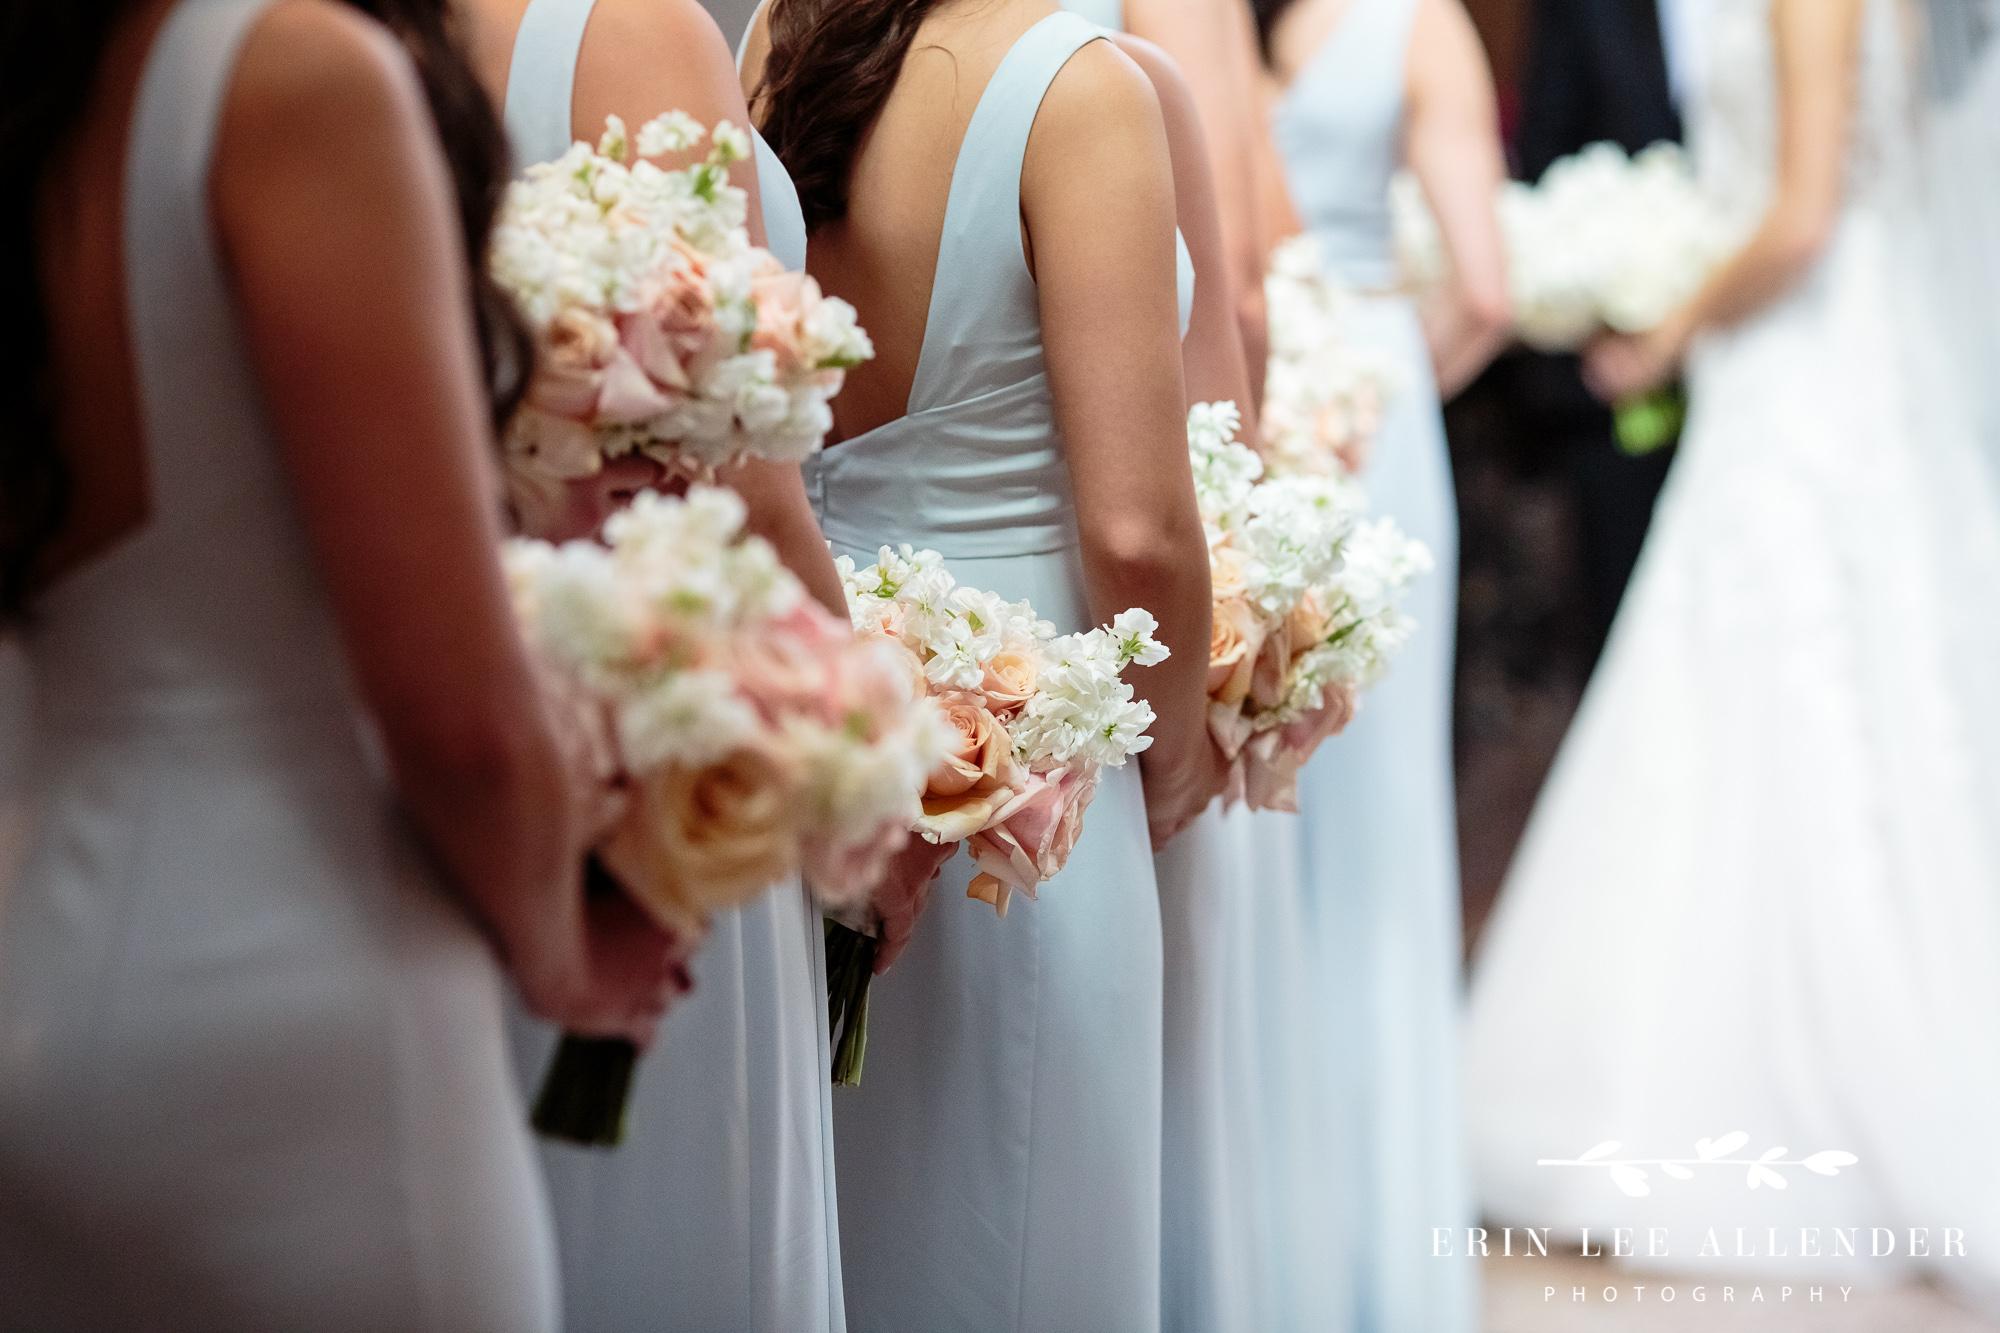 bridesmaids-holding-flowers